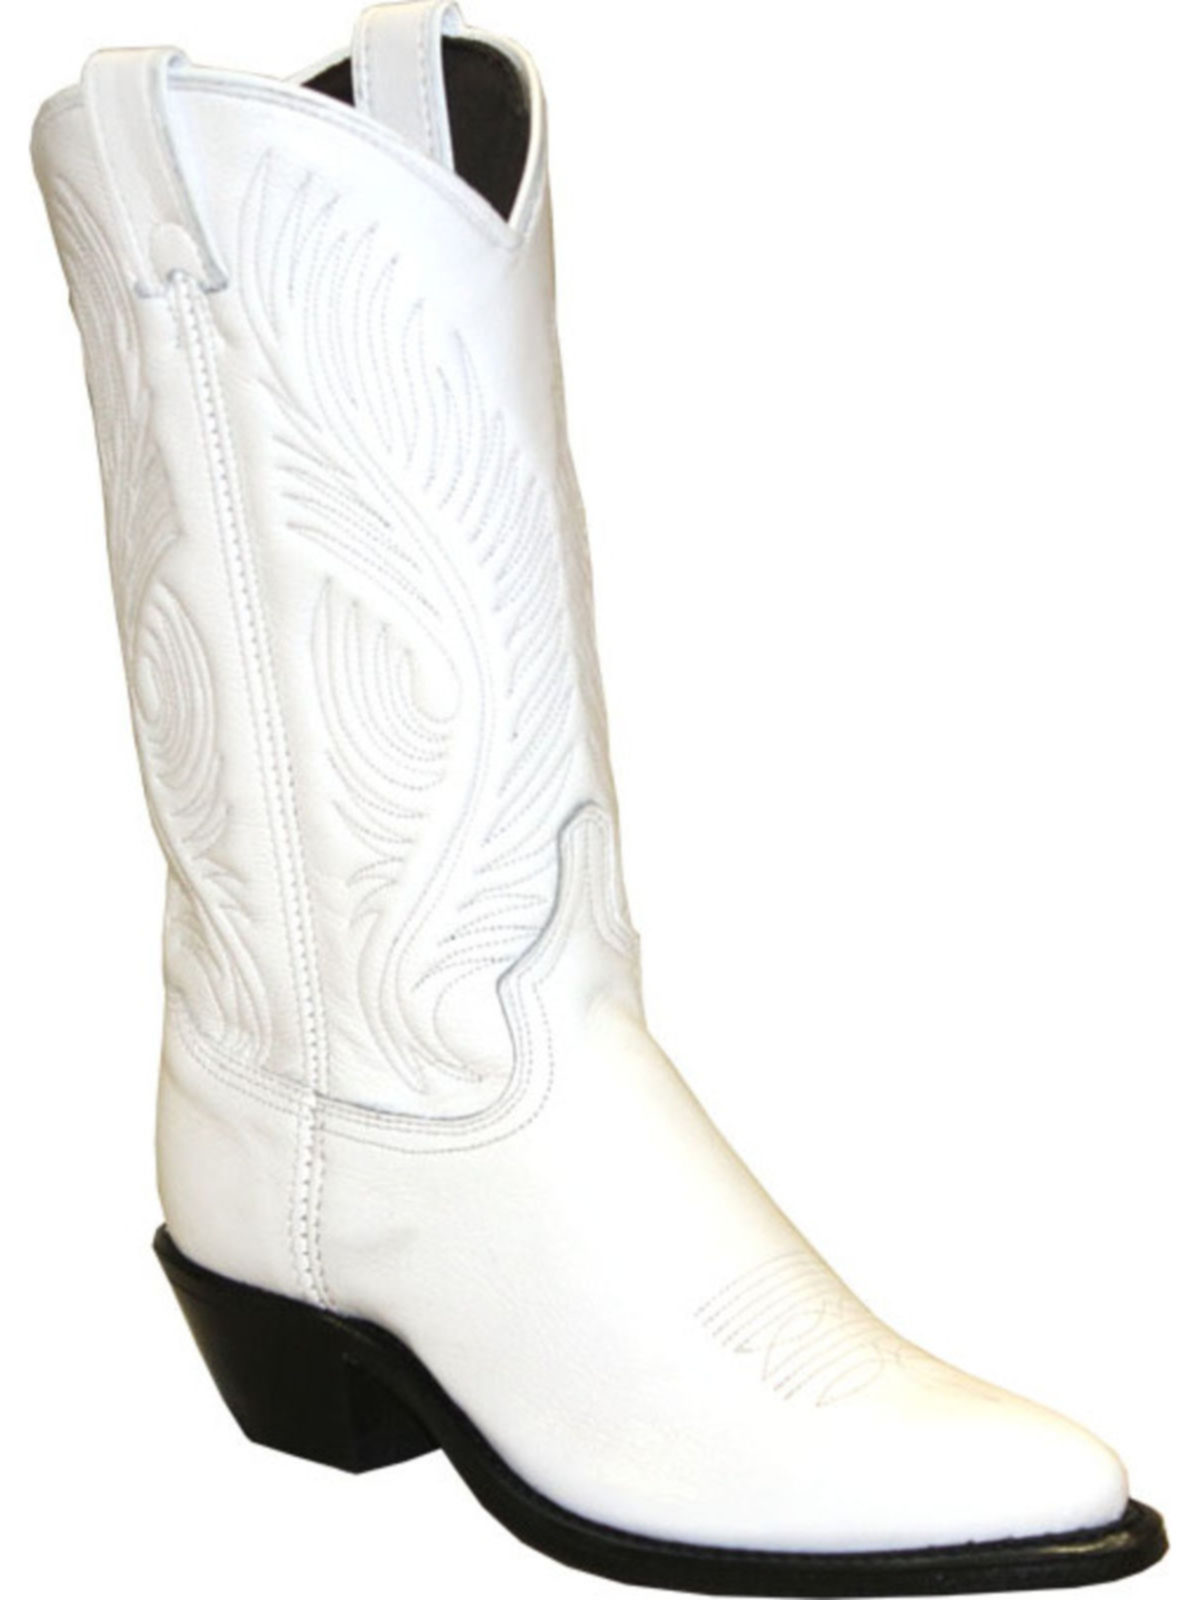 Bootamerica Abilene Womens White Cowhide Cowgirl Boots 9054